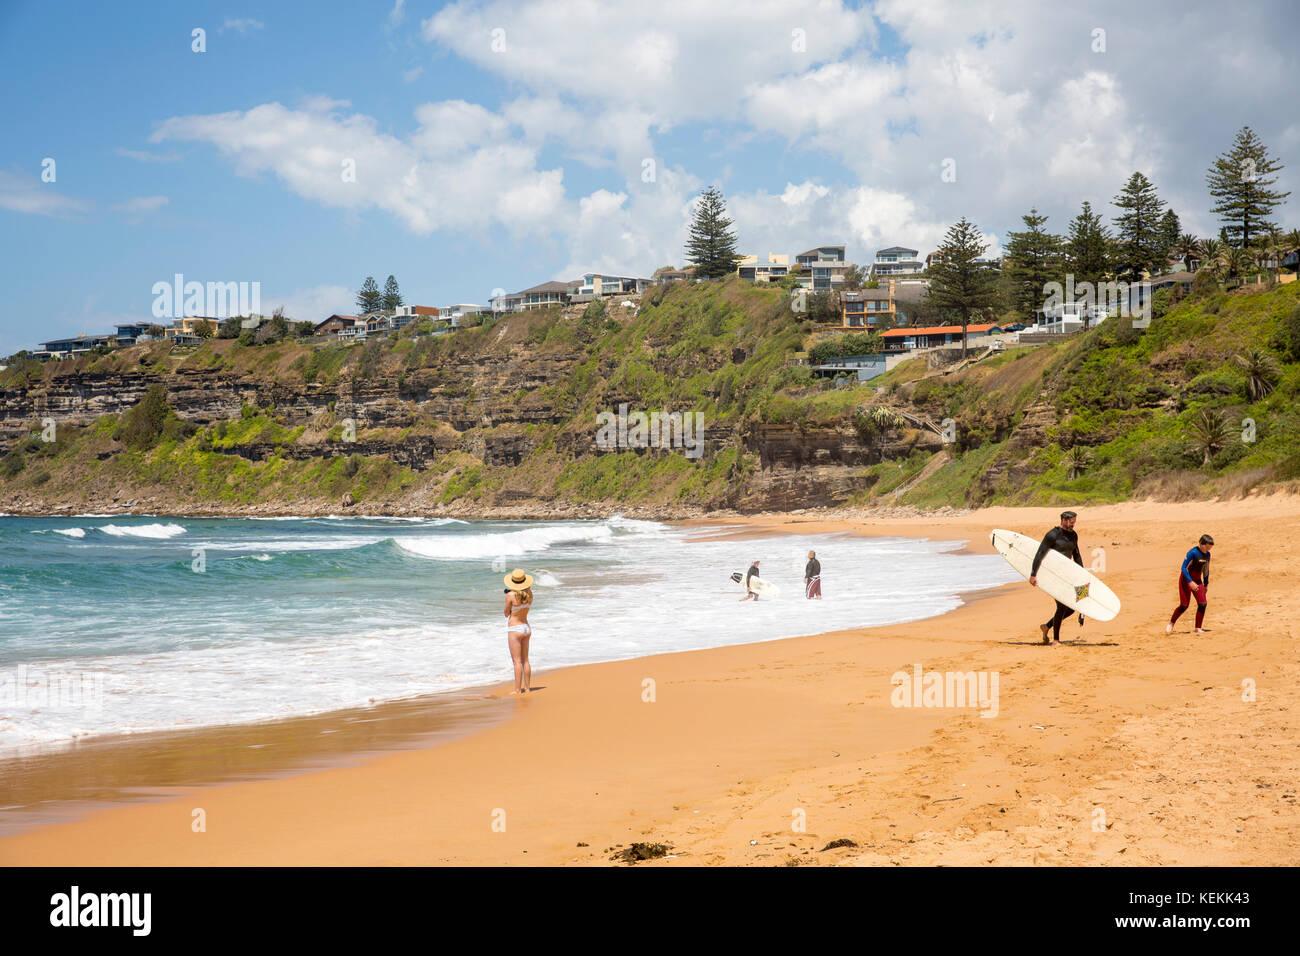 Surfers on Bungan beach, popular surf beach on Sydney northern beaches,new south wales, australia Stock Photo